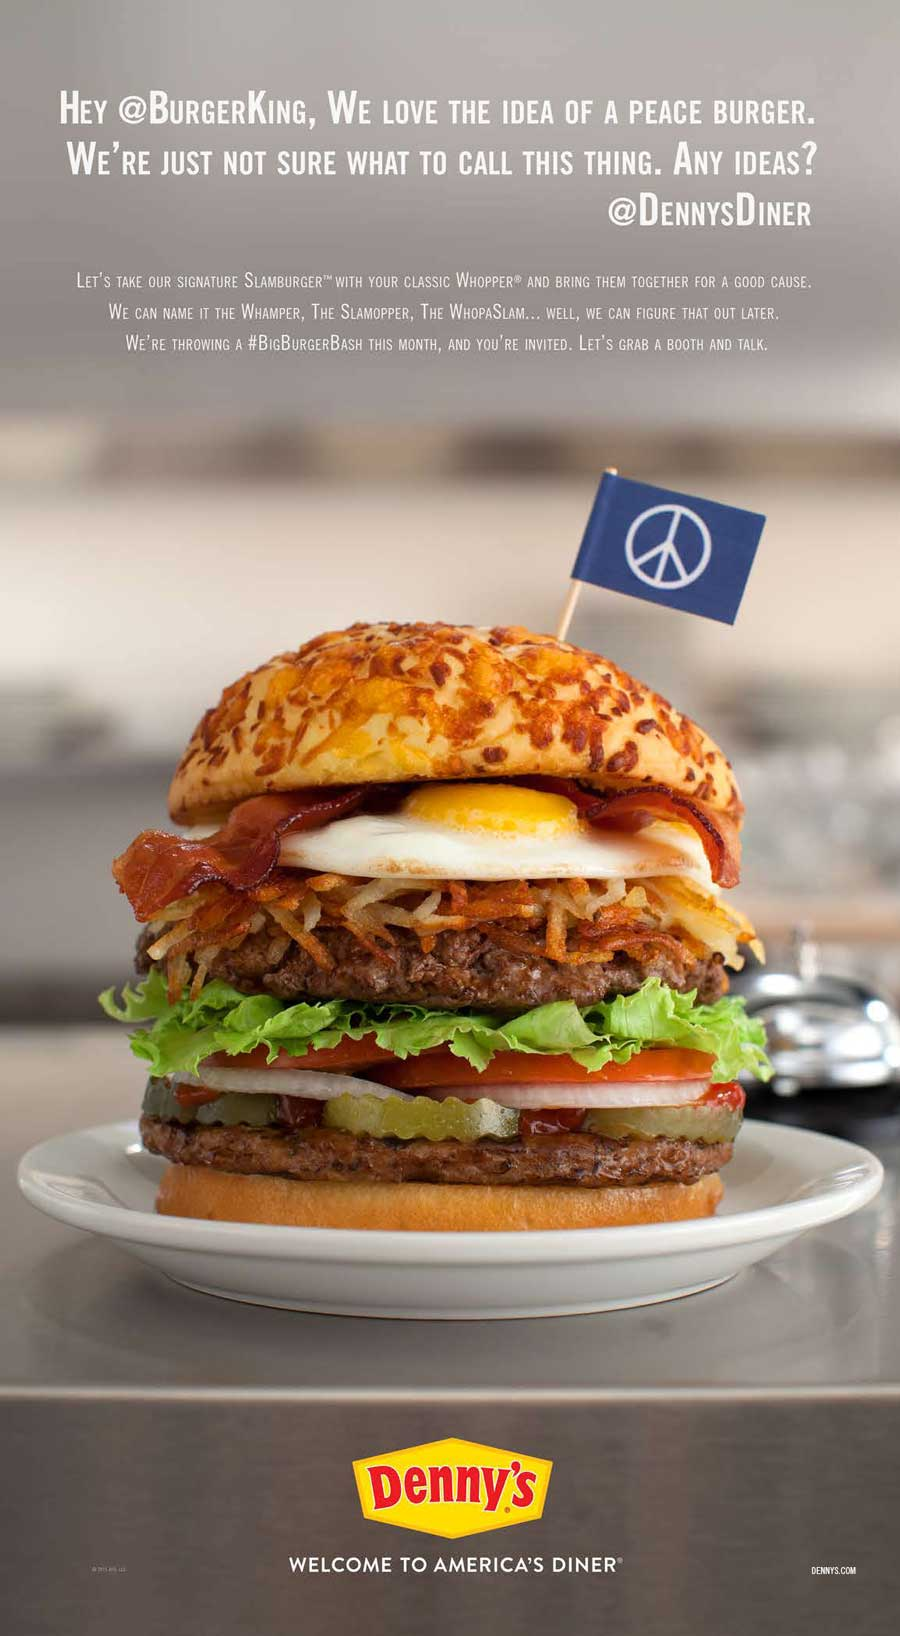 Dennys-BK-Peace-Burger